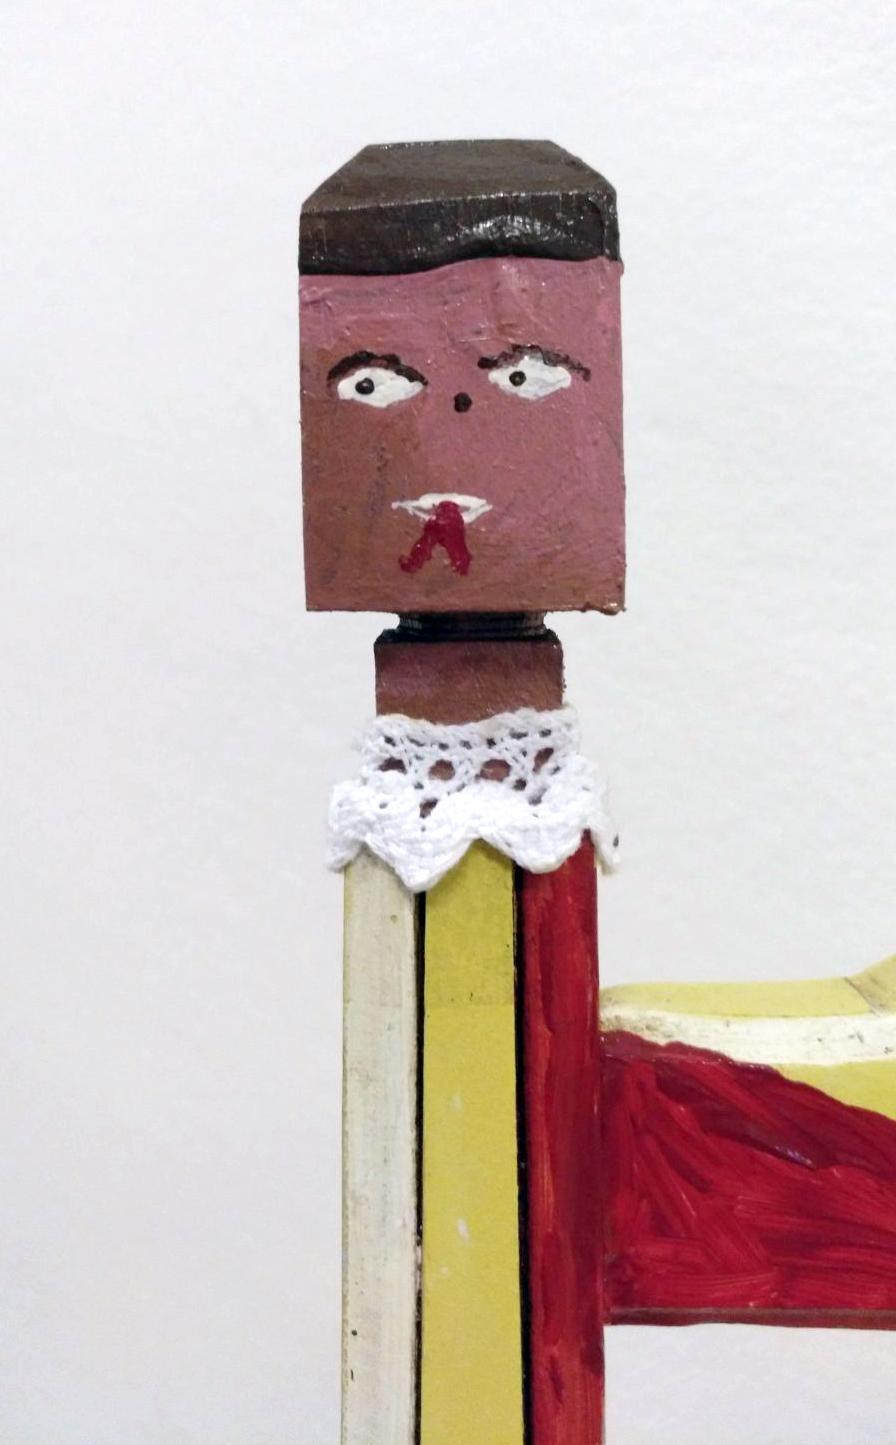 2-maf-2018-eldevenir-art-gallery-galeria-arte-online-maria-bueno-jose-luis-puche-ateneo.jpg